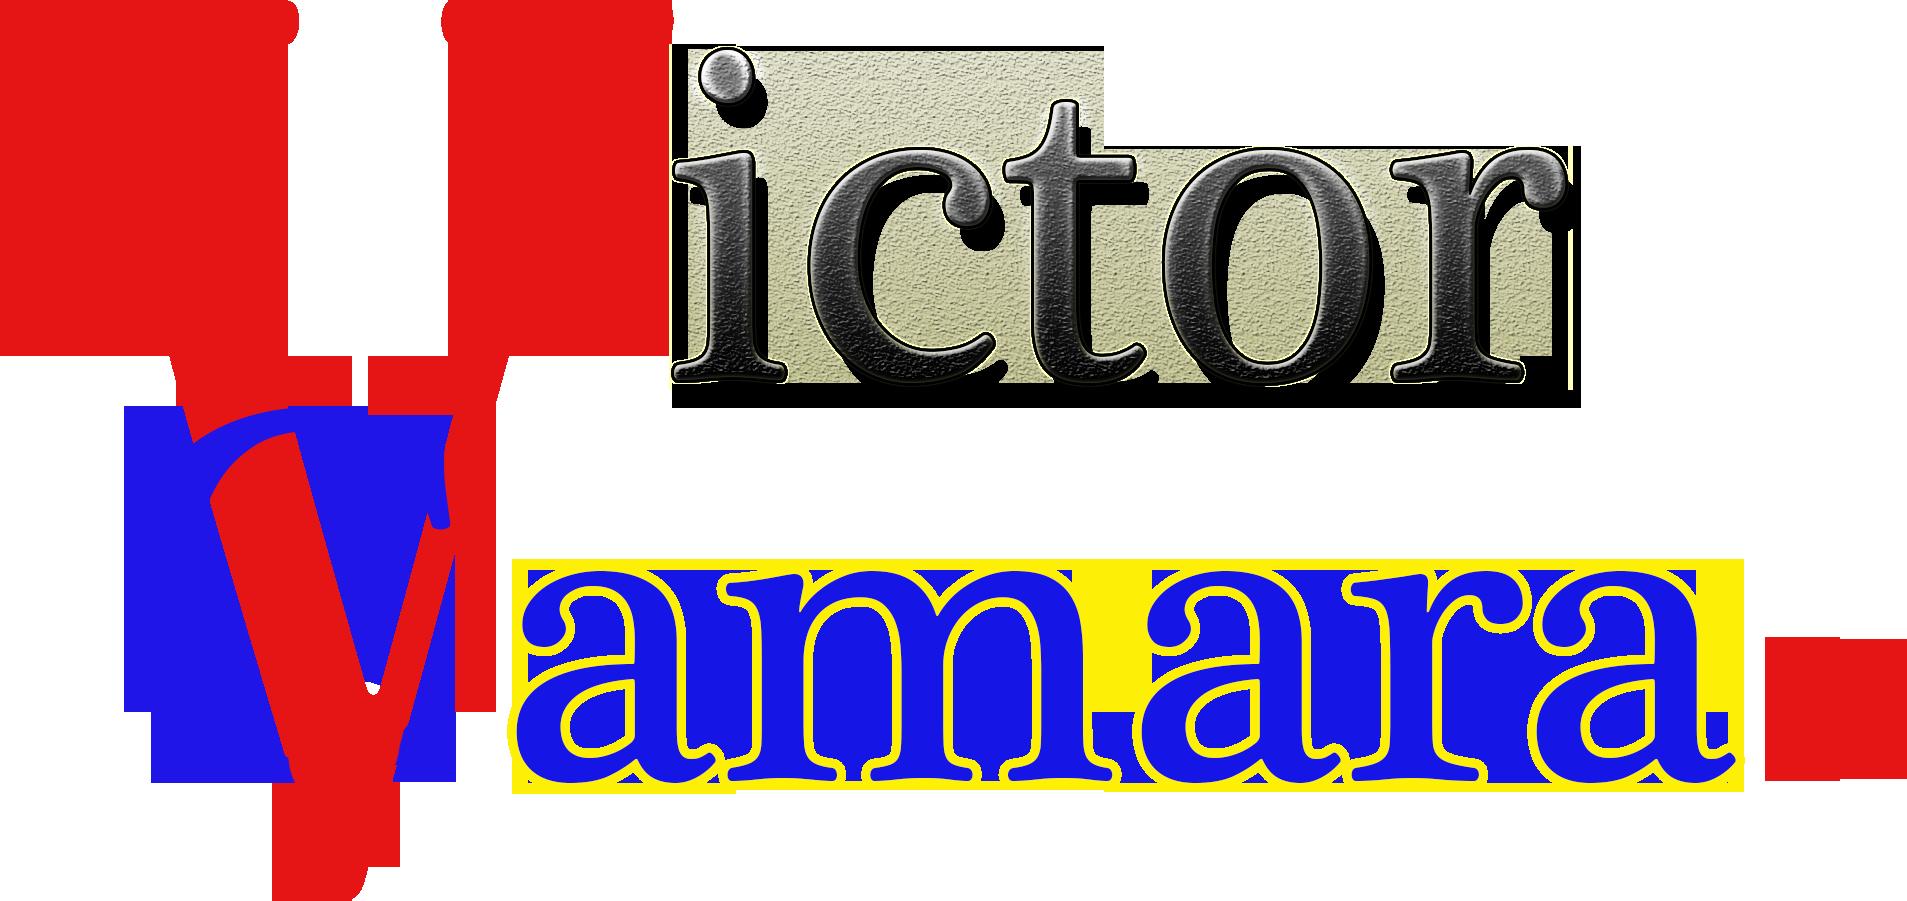 Victor-Camara